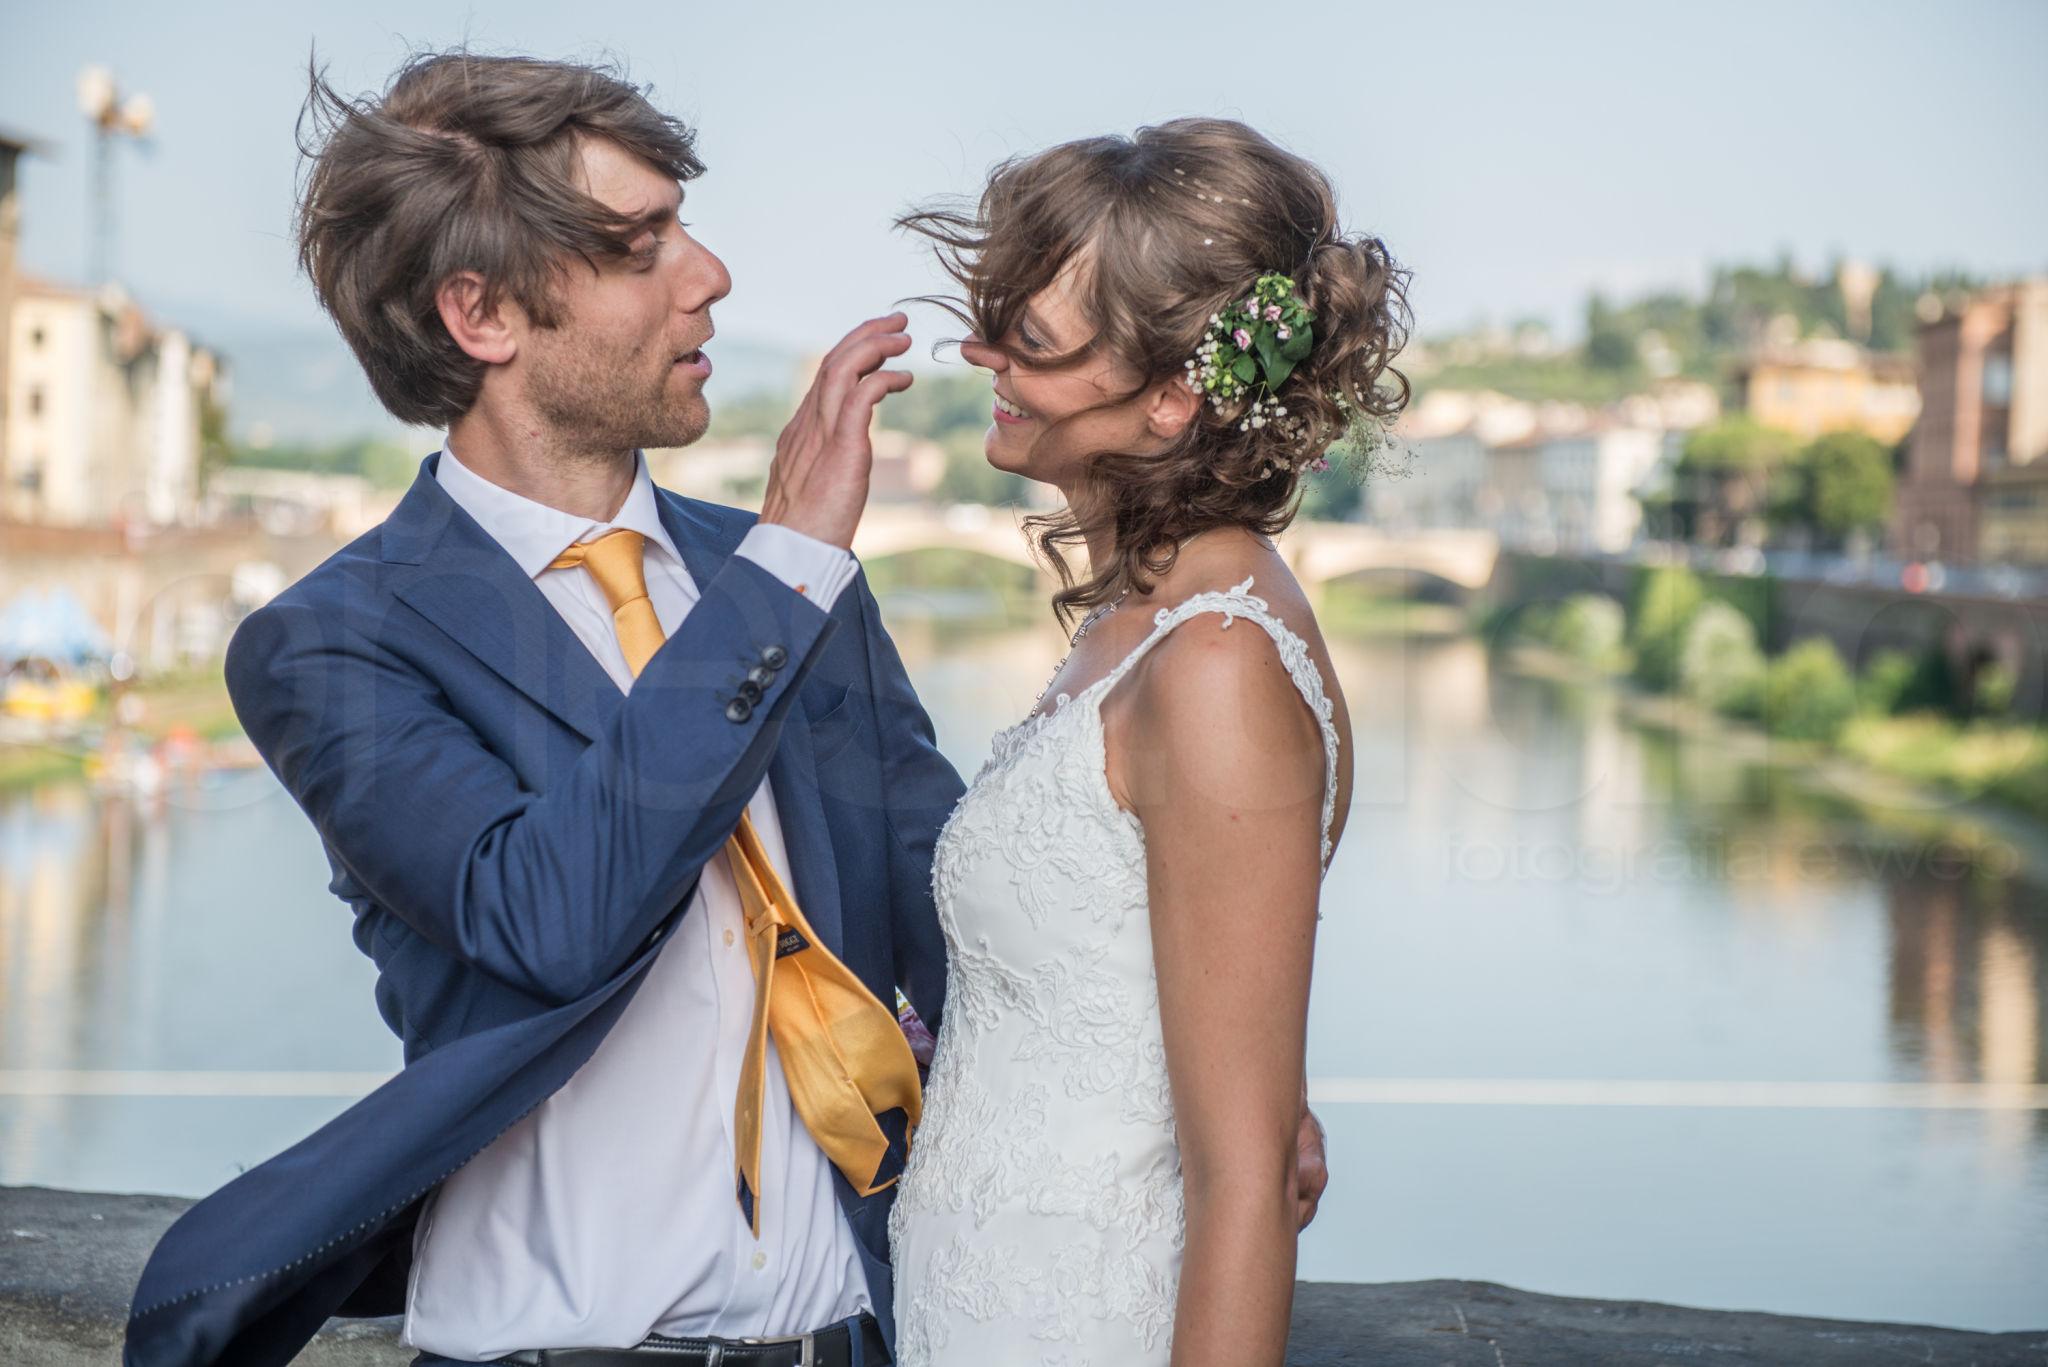 https://lnx.mirkone.it/wp-content/uploads/2015/07/fotografo-matrimoni-faenza-0025-2.jpg